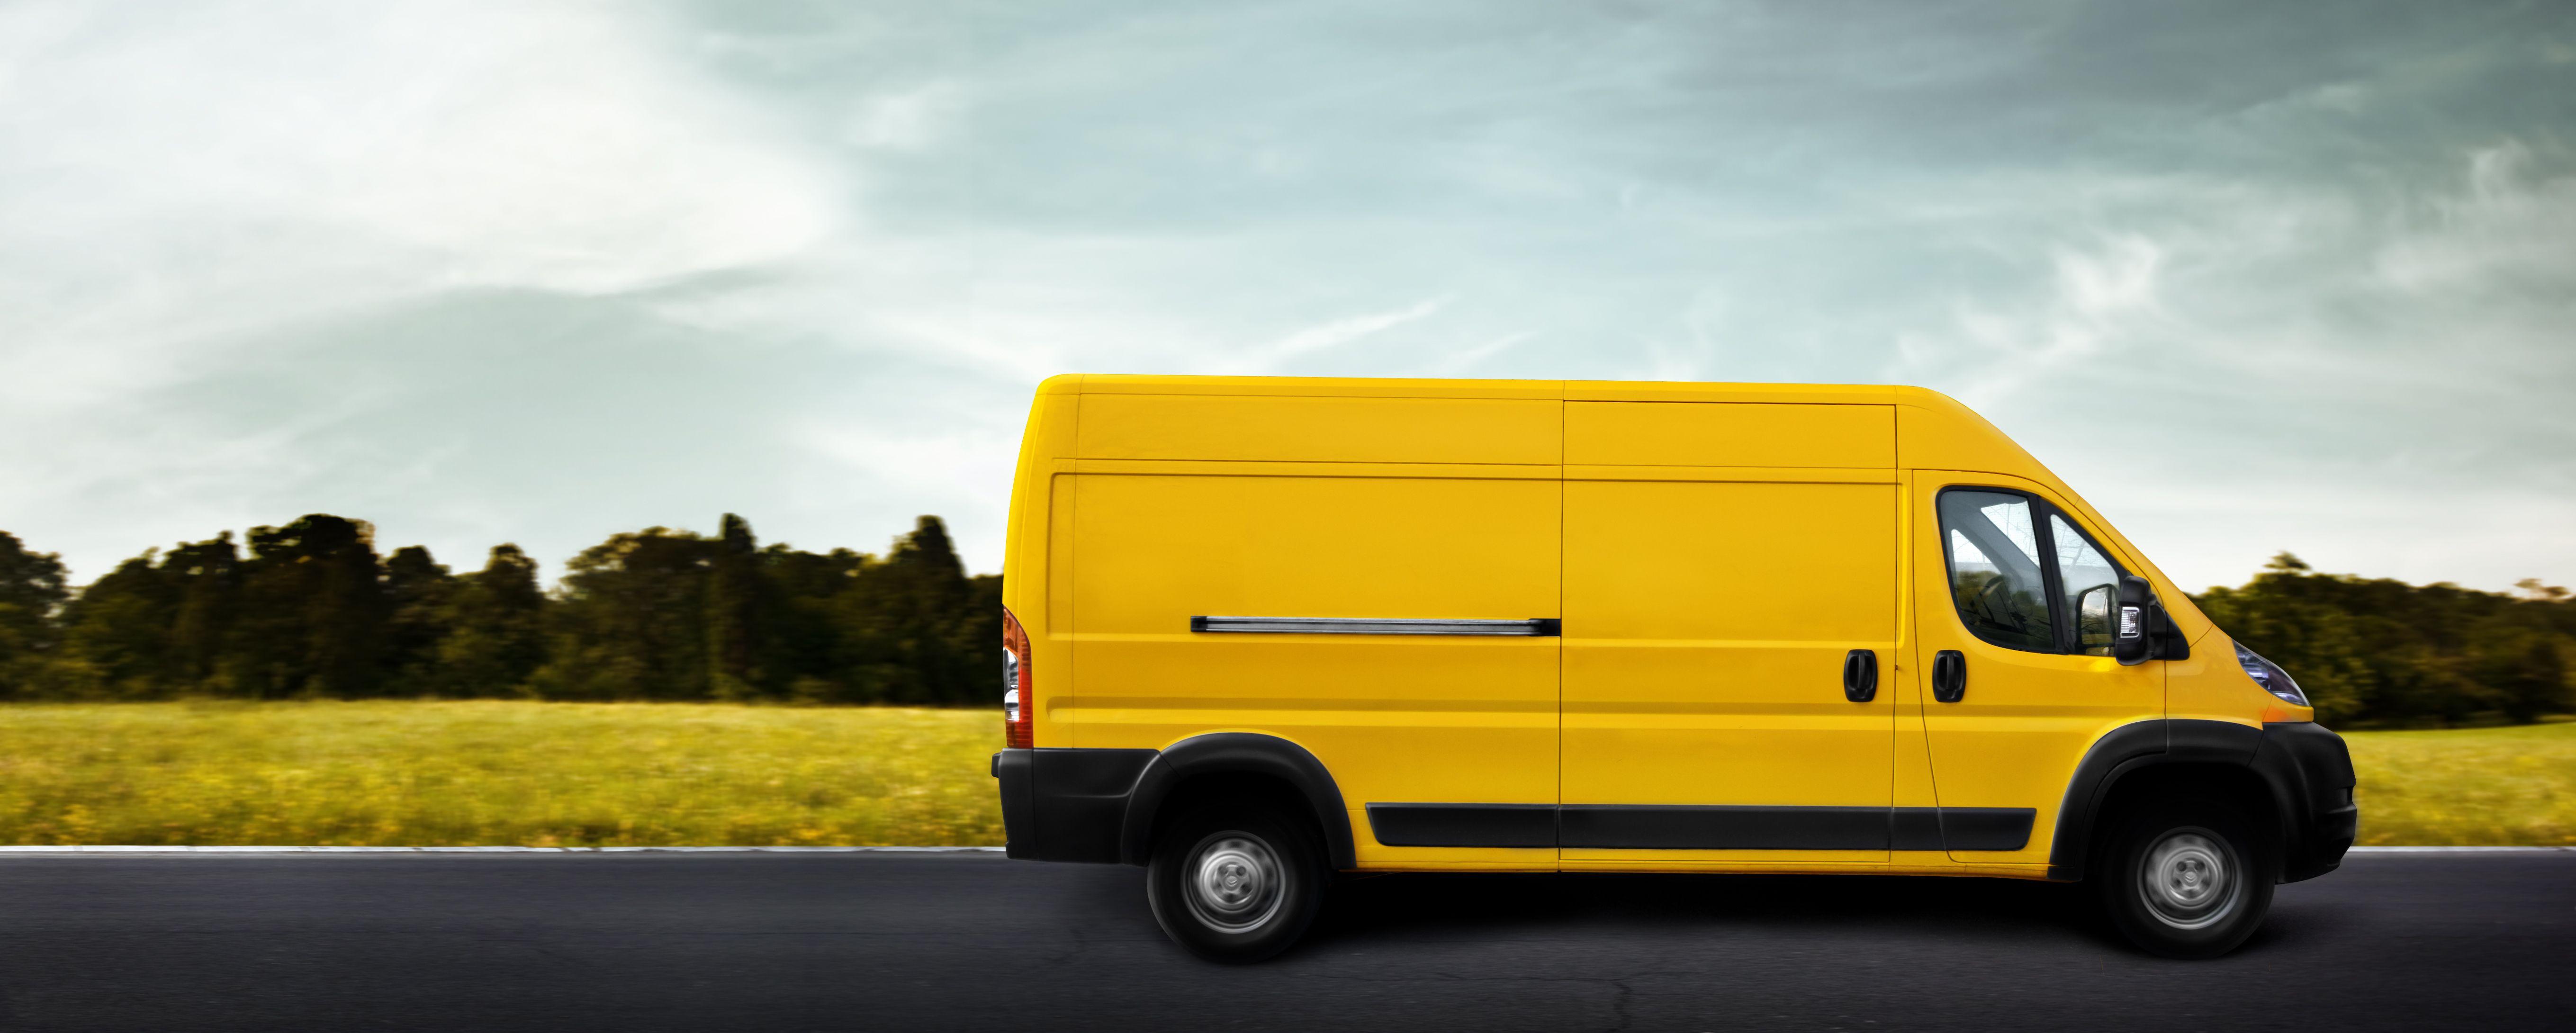 Transporte por carretera: Servicios de Tradisma Ripollet 97 SLU